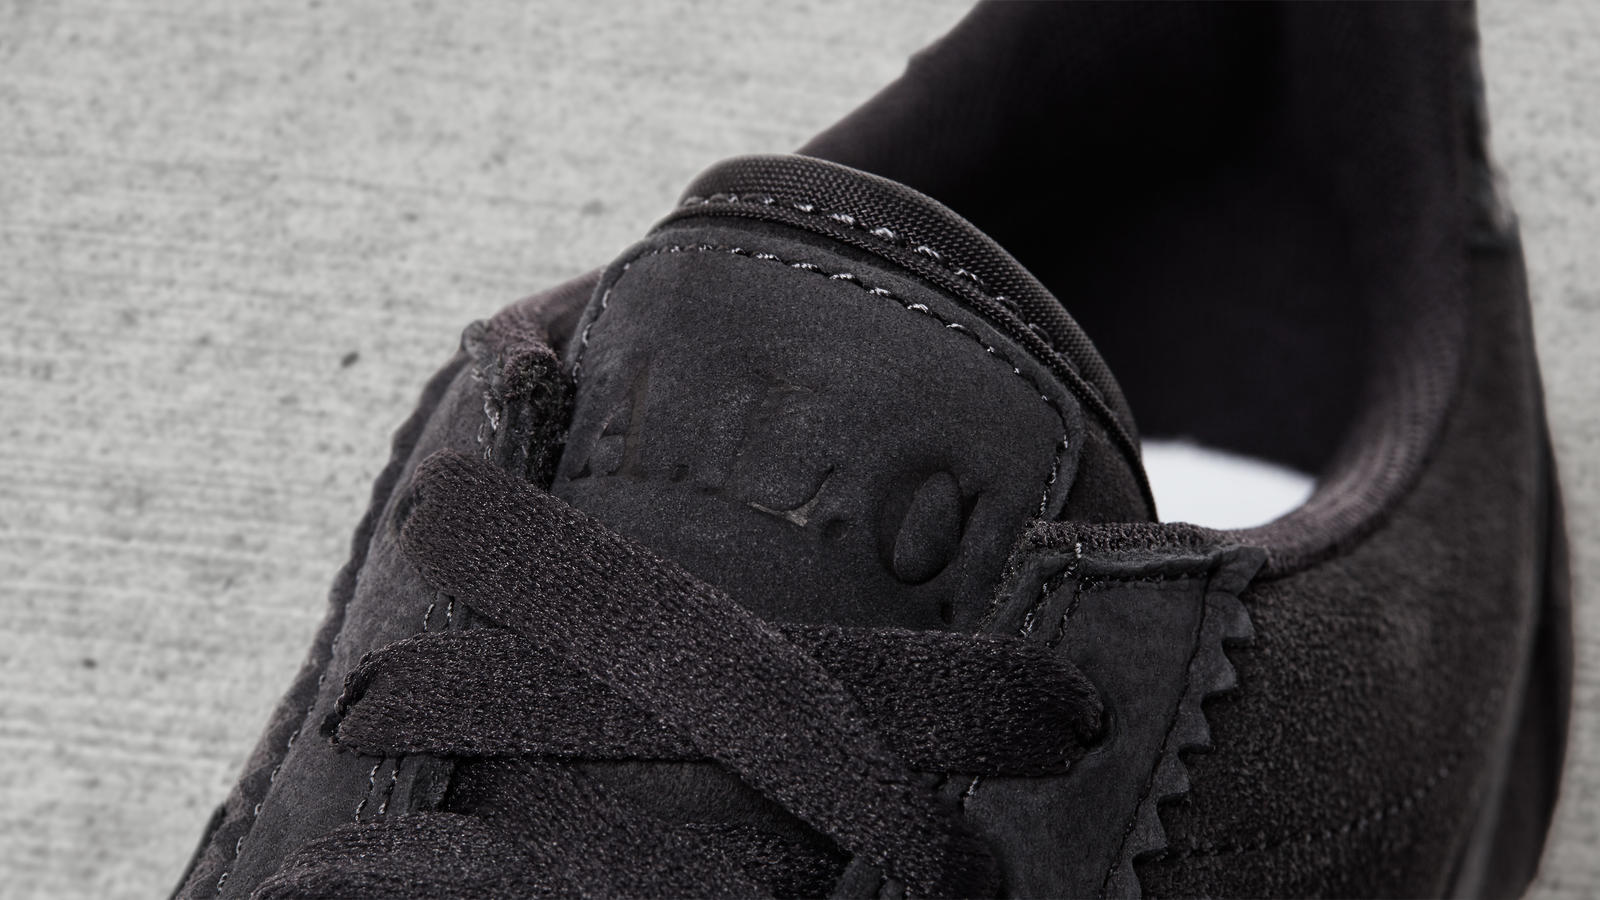 Nike Cortez Classic LX x ALC 0